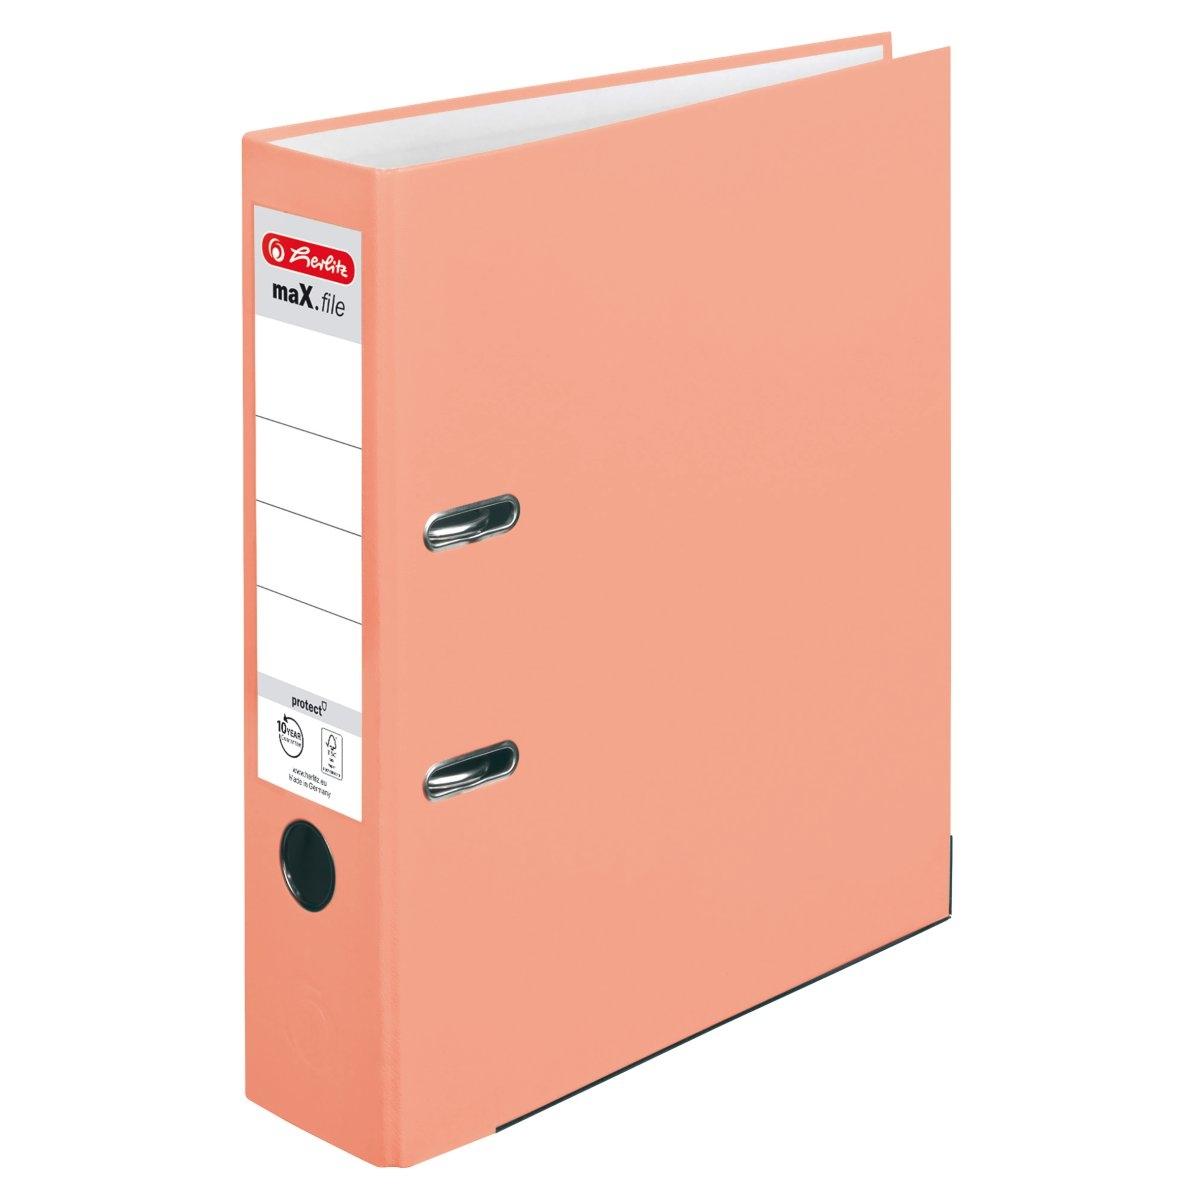 Segregator maX.file protect A4 8cm łososiowy (50028467)